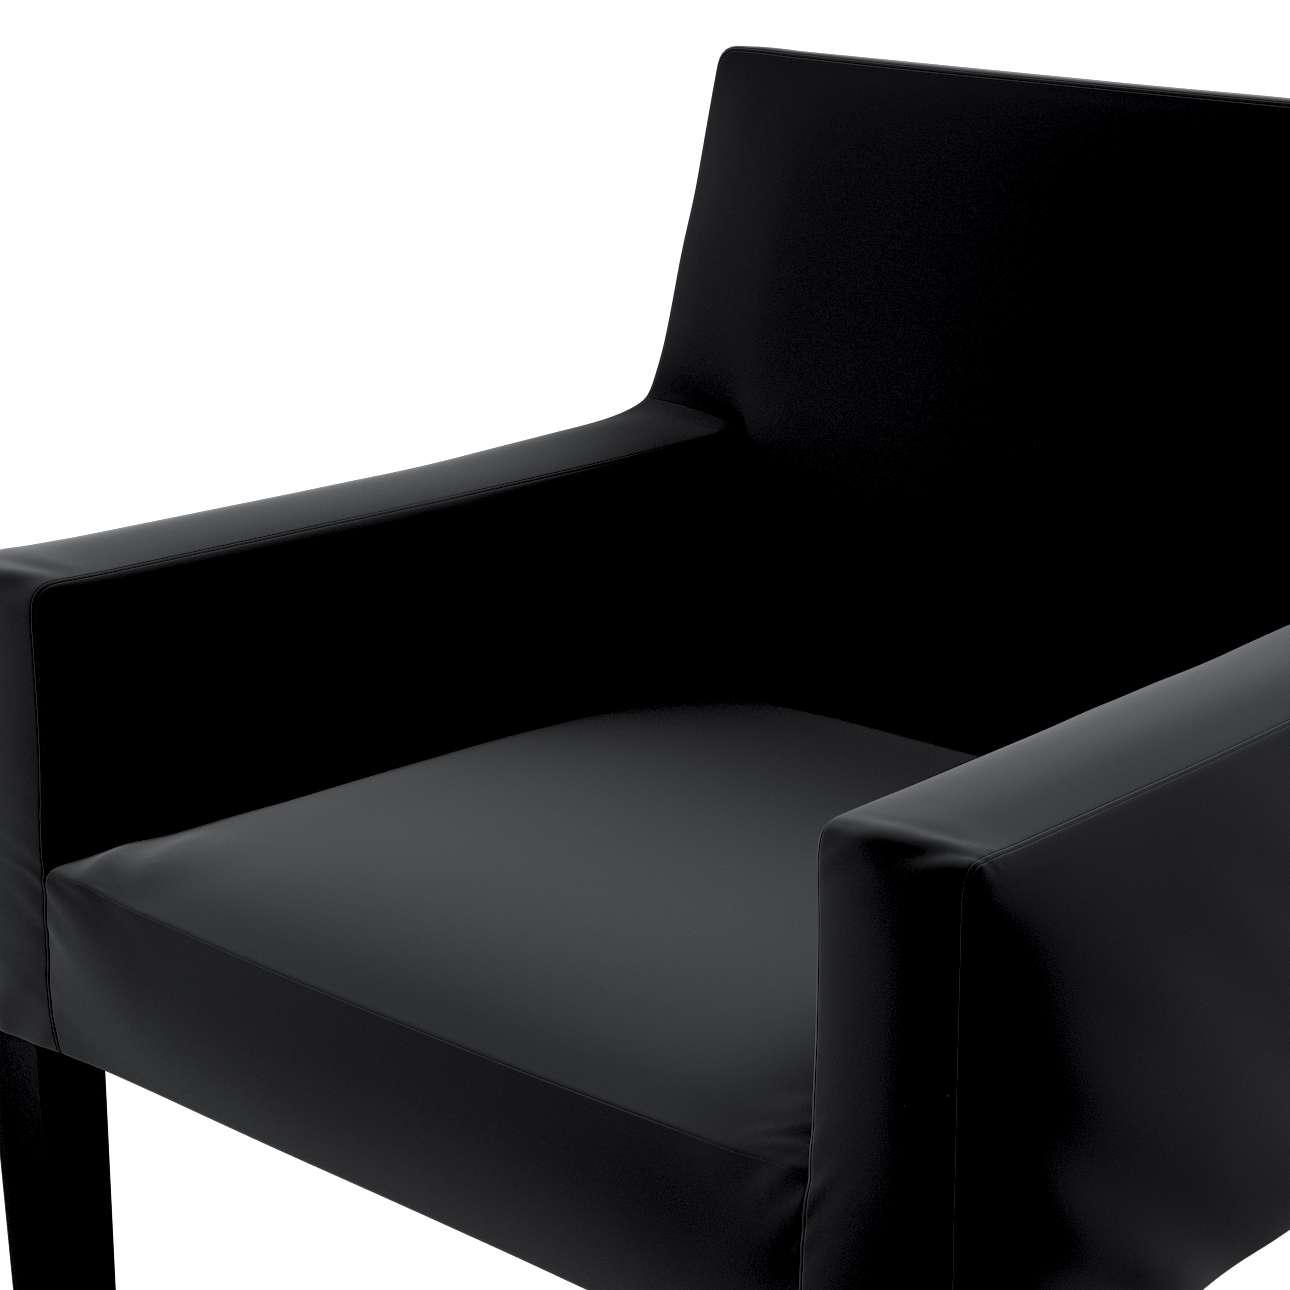 Návlek na stoličku s opierkami Nils V kolekcii Velvet, tkanina: 704-17